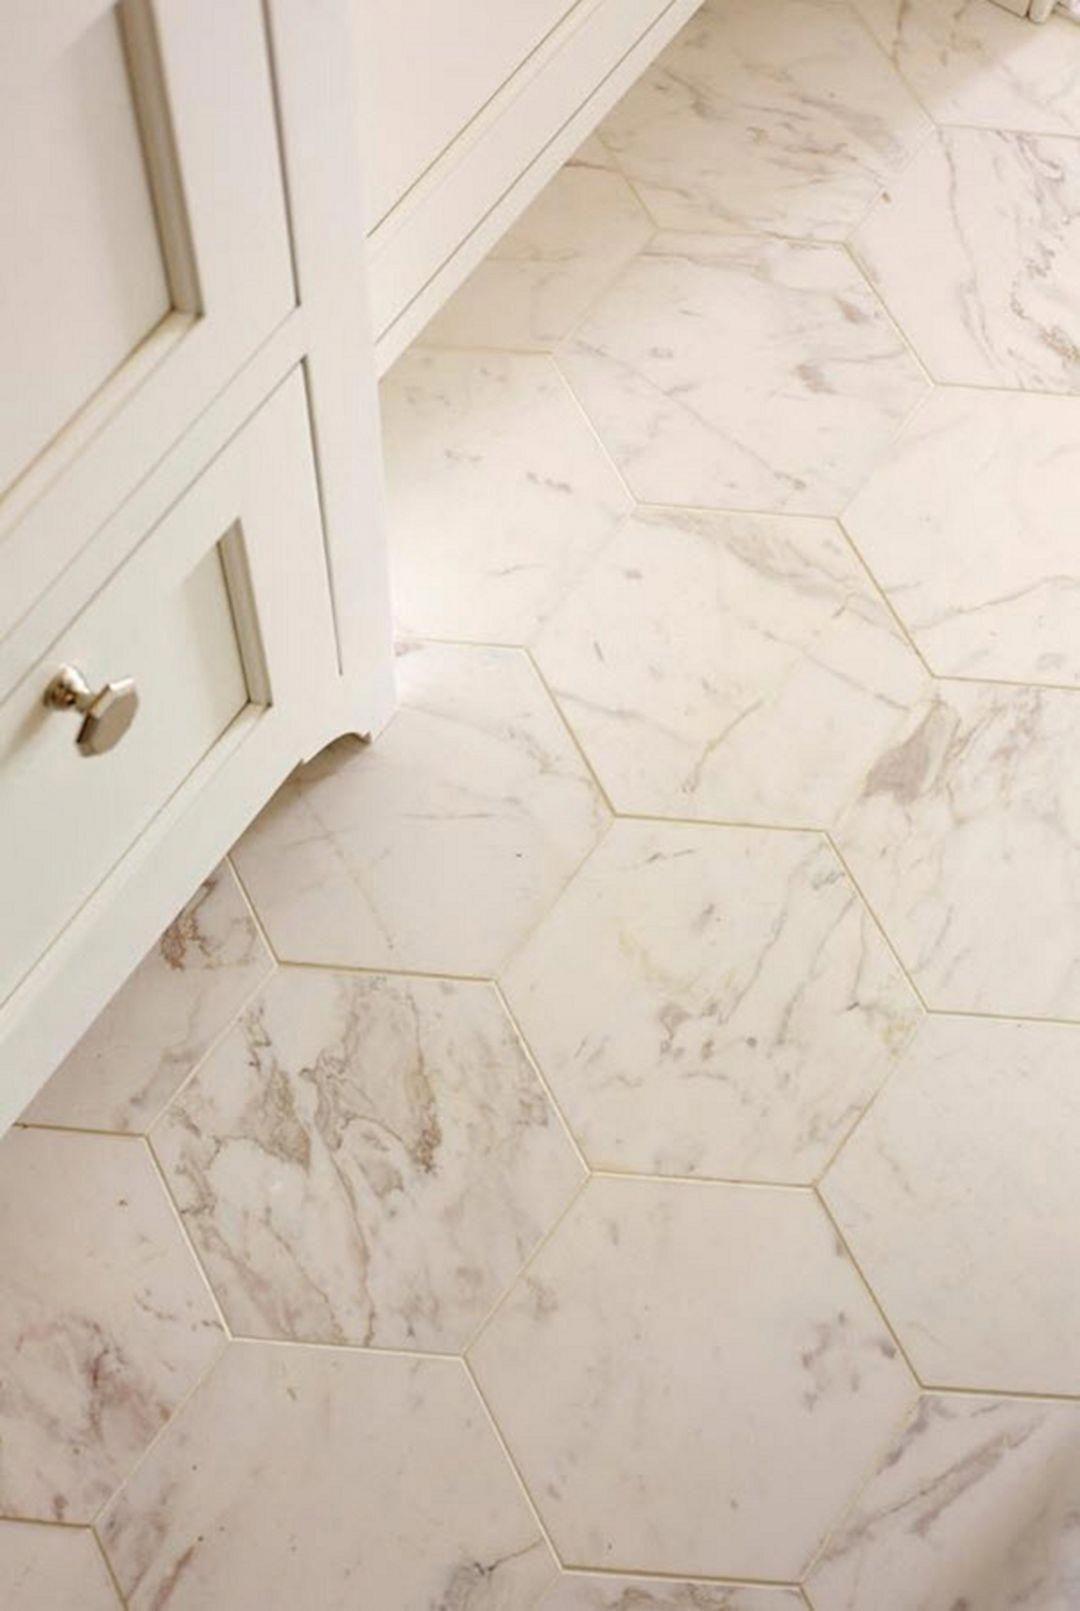 Bathroomdesignideas Bathroom Tile Designs Bathroom Floor Tiles Flooring